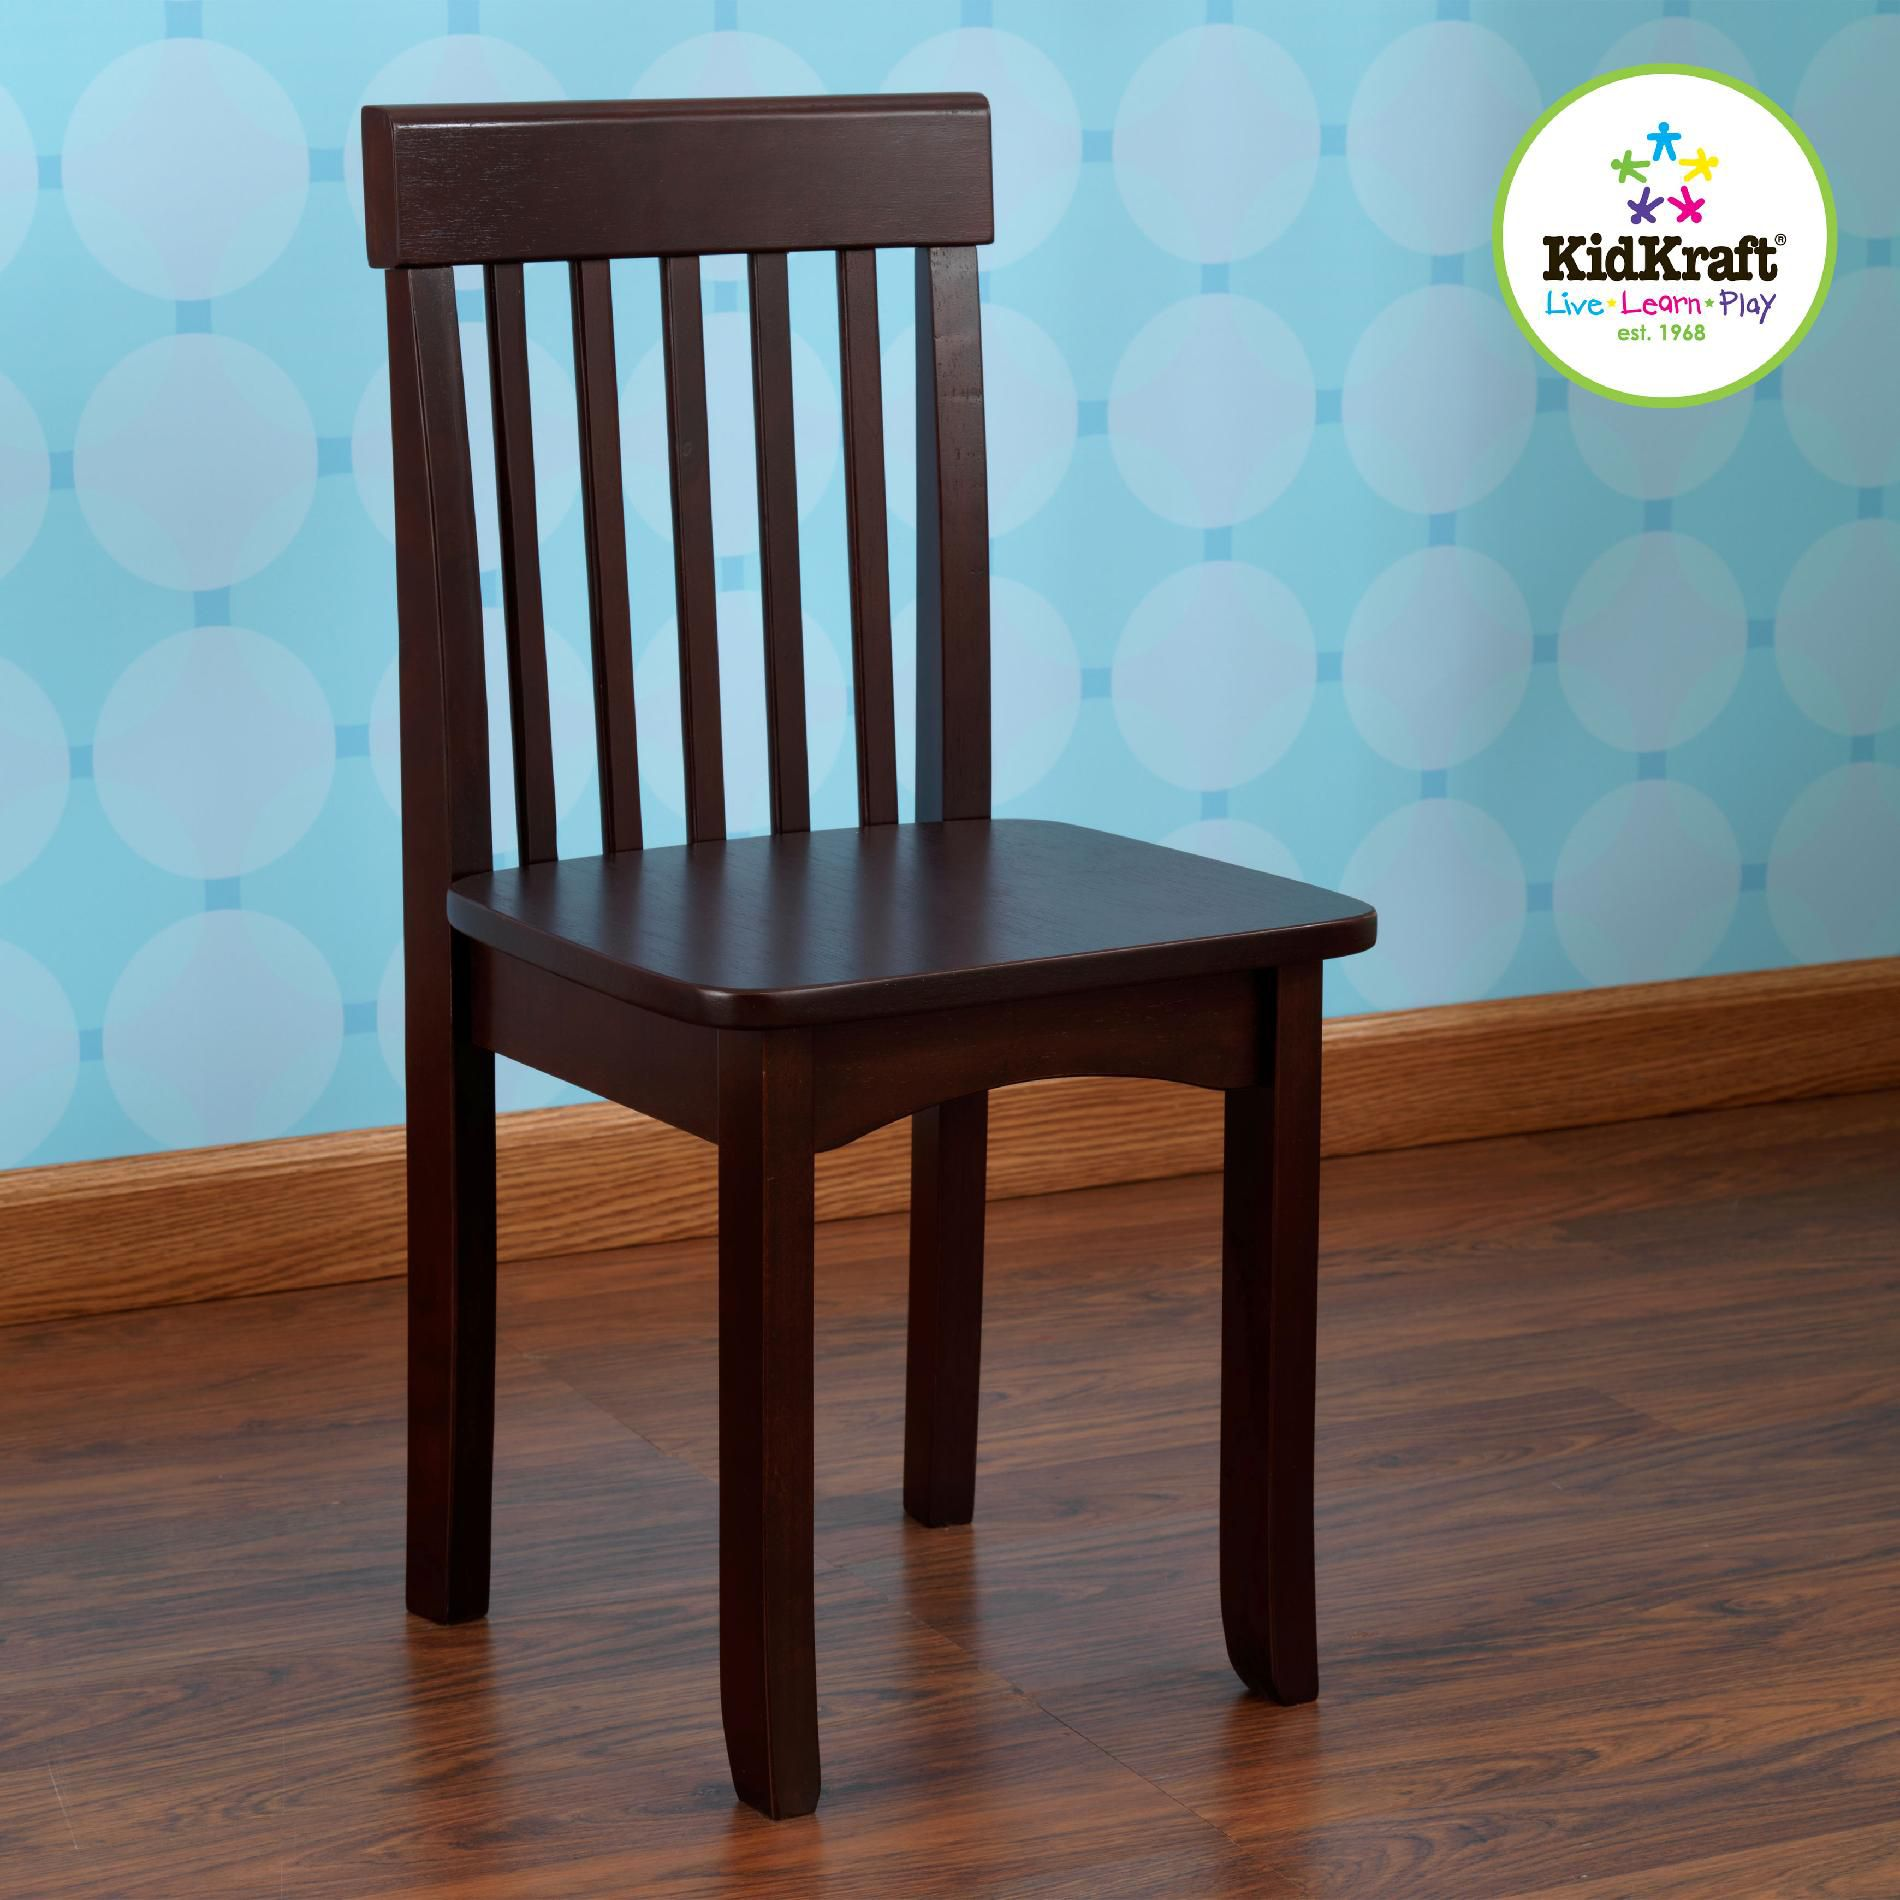 kidkraft avalon chair lawn cushions upc 706943166505 espresso